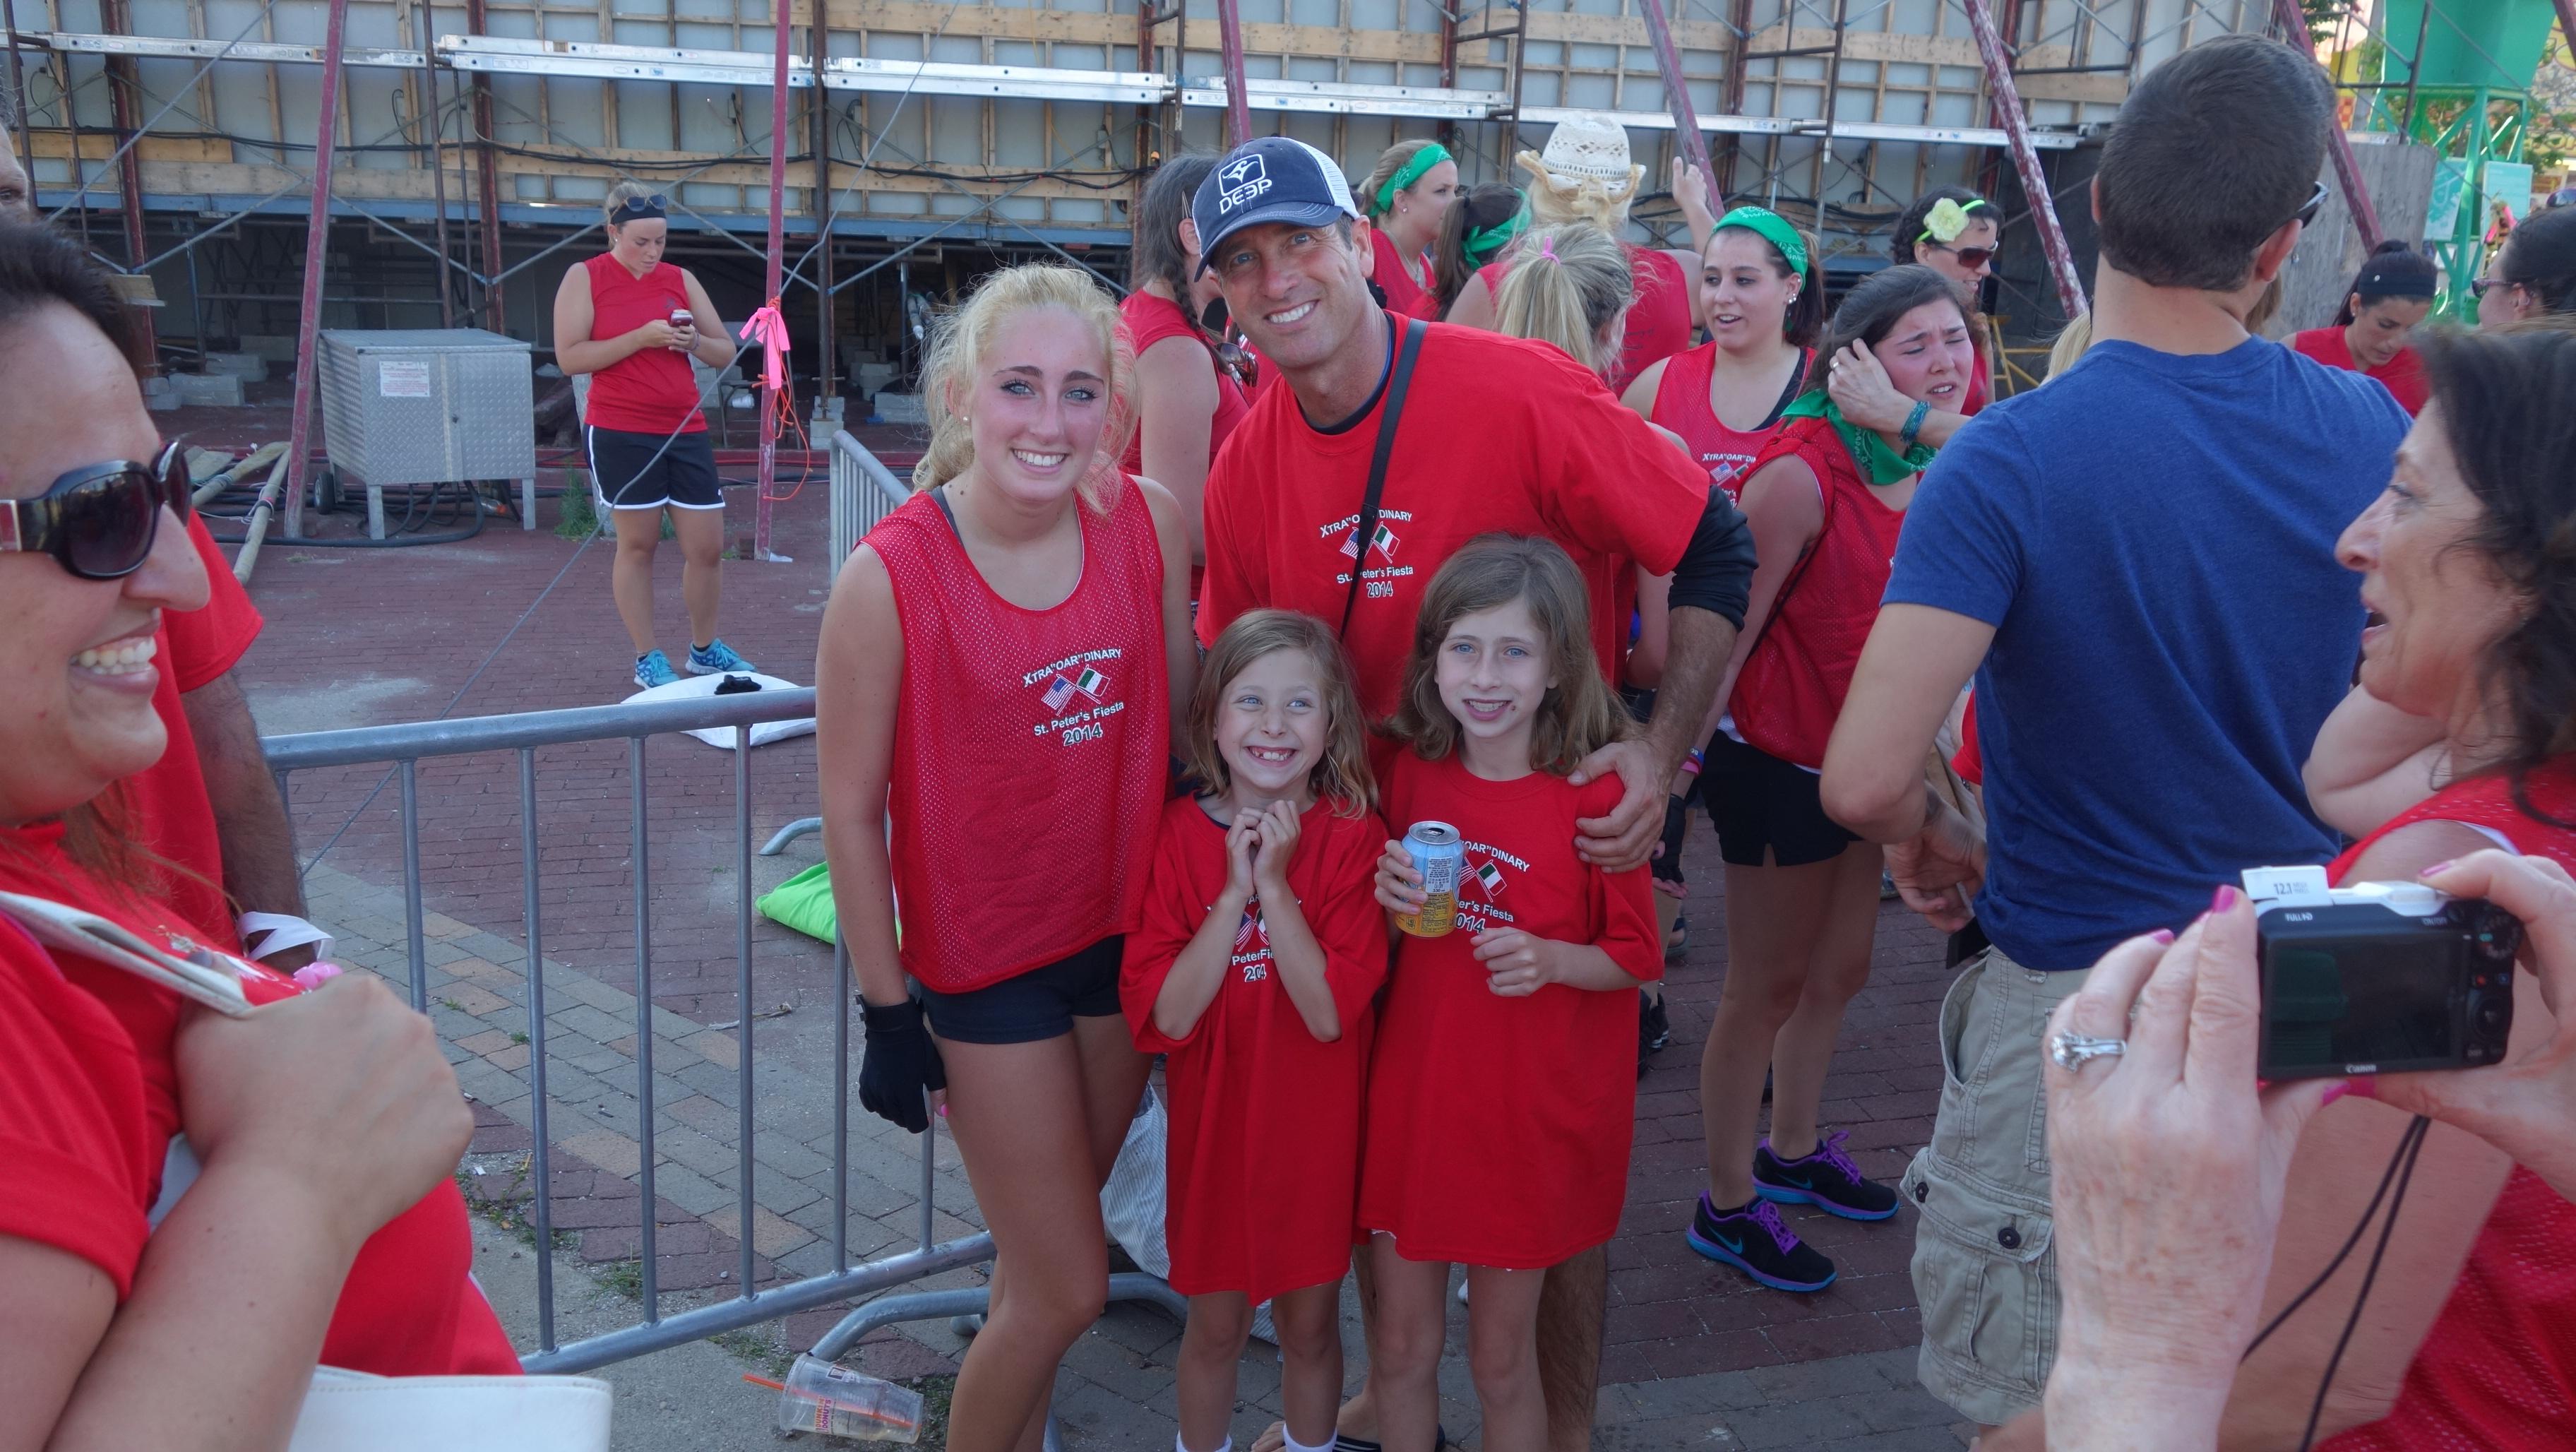 Amanda Race St. Peter's Fiesta 2014 Camps! 344